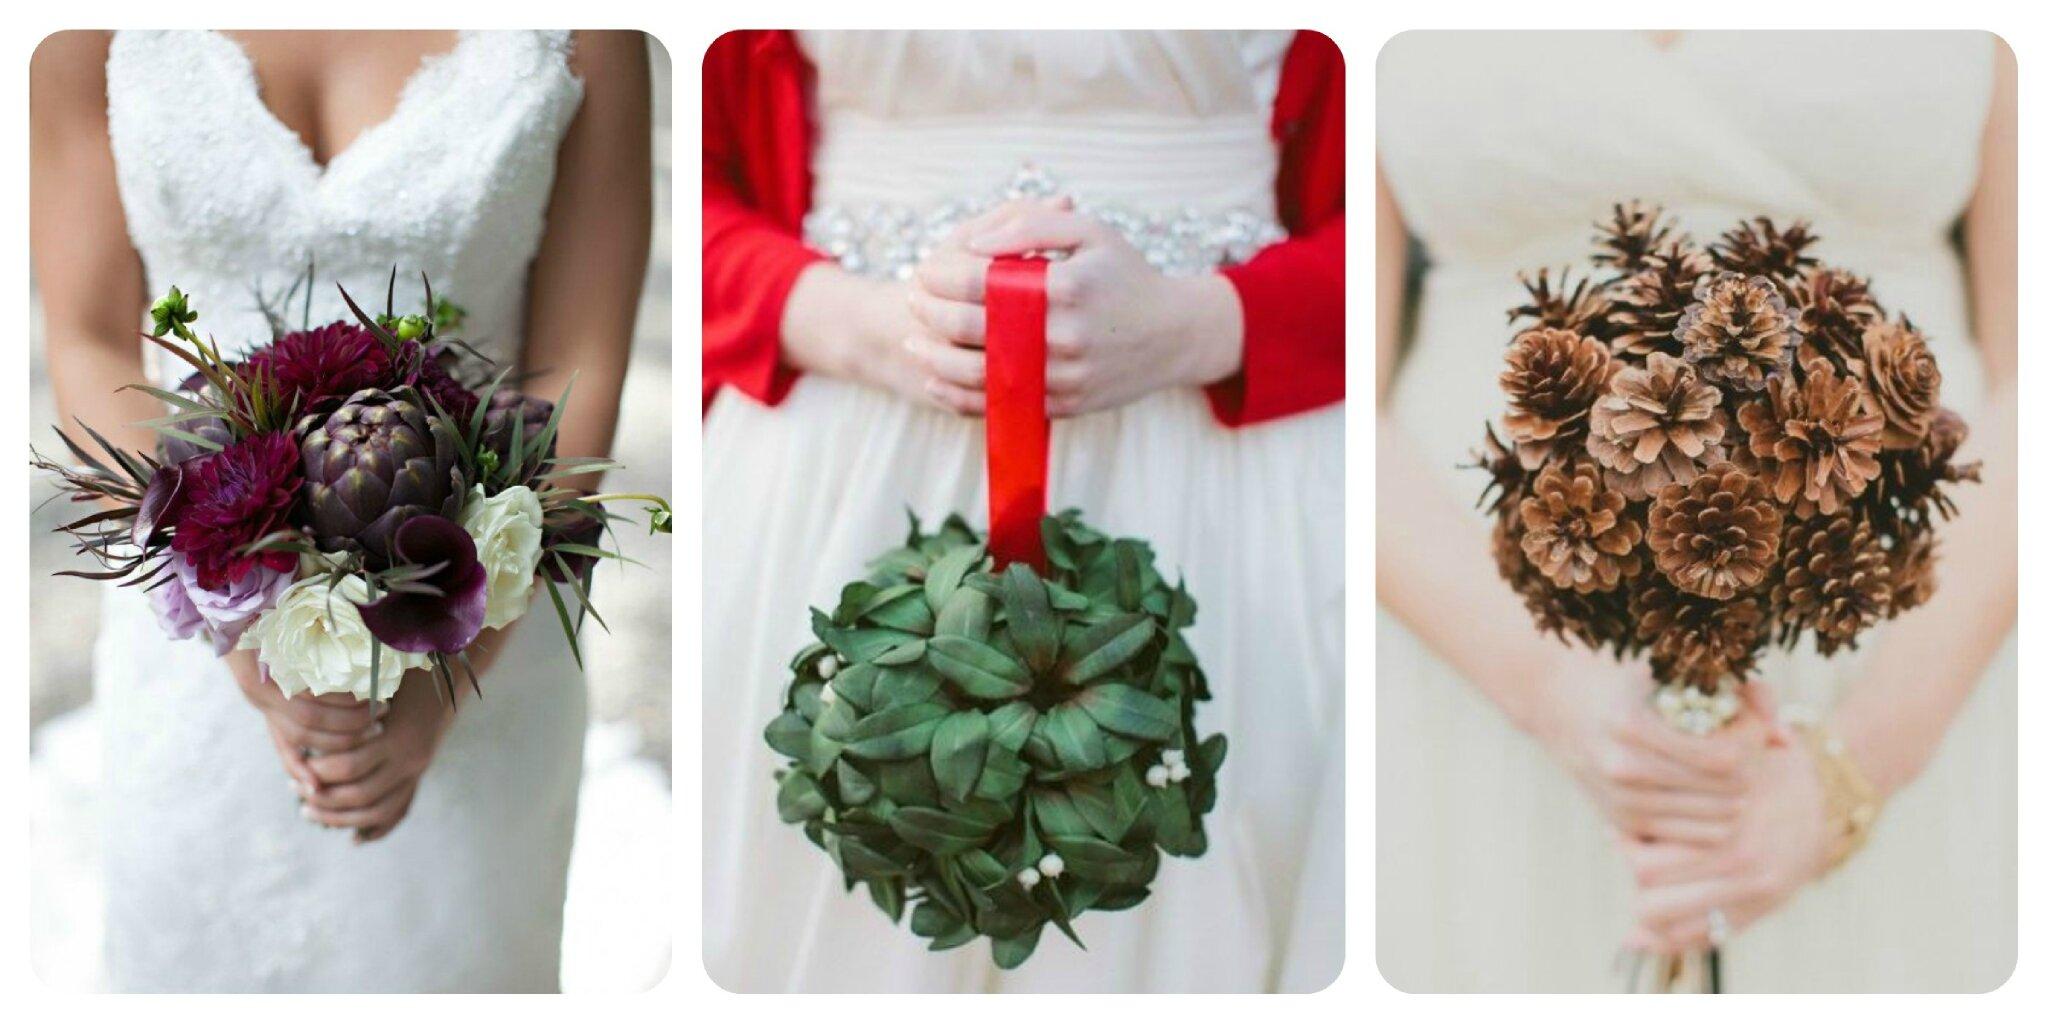 mariage fleurs d 39 hiver mamzelle drag es. Black Bedroom Furniture Sets. Home Design Ideas